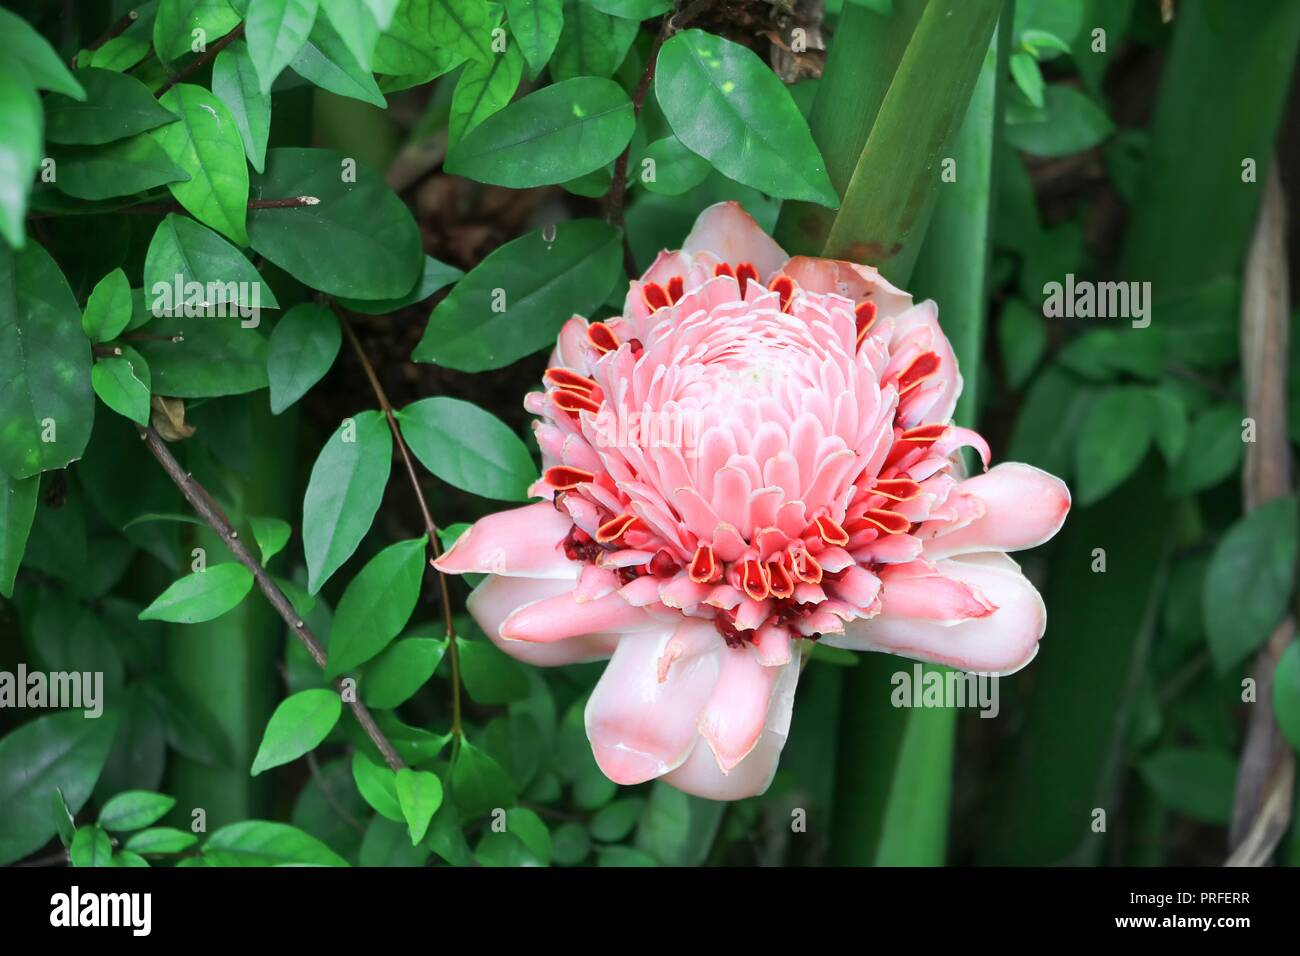 Antorcha rosa flores locales de jengibre, etlingera elatior, familia Zingiberaceae Bohol, Filipinas Foto de stock